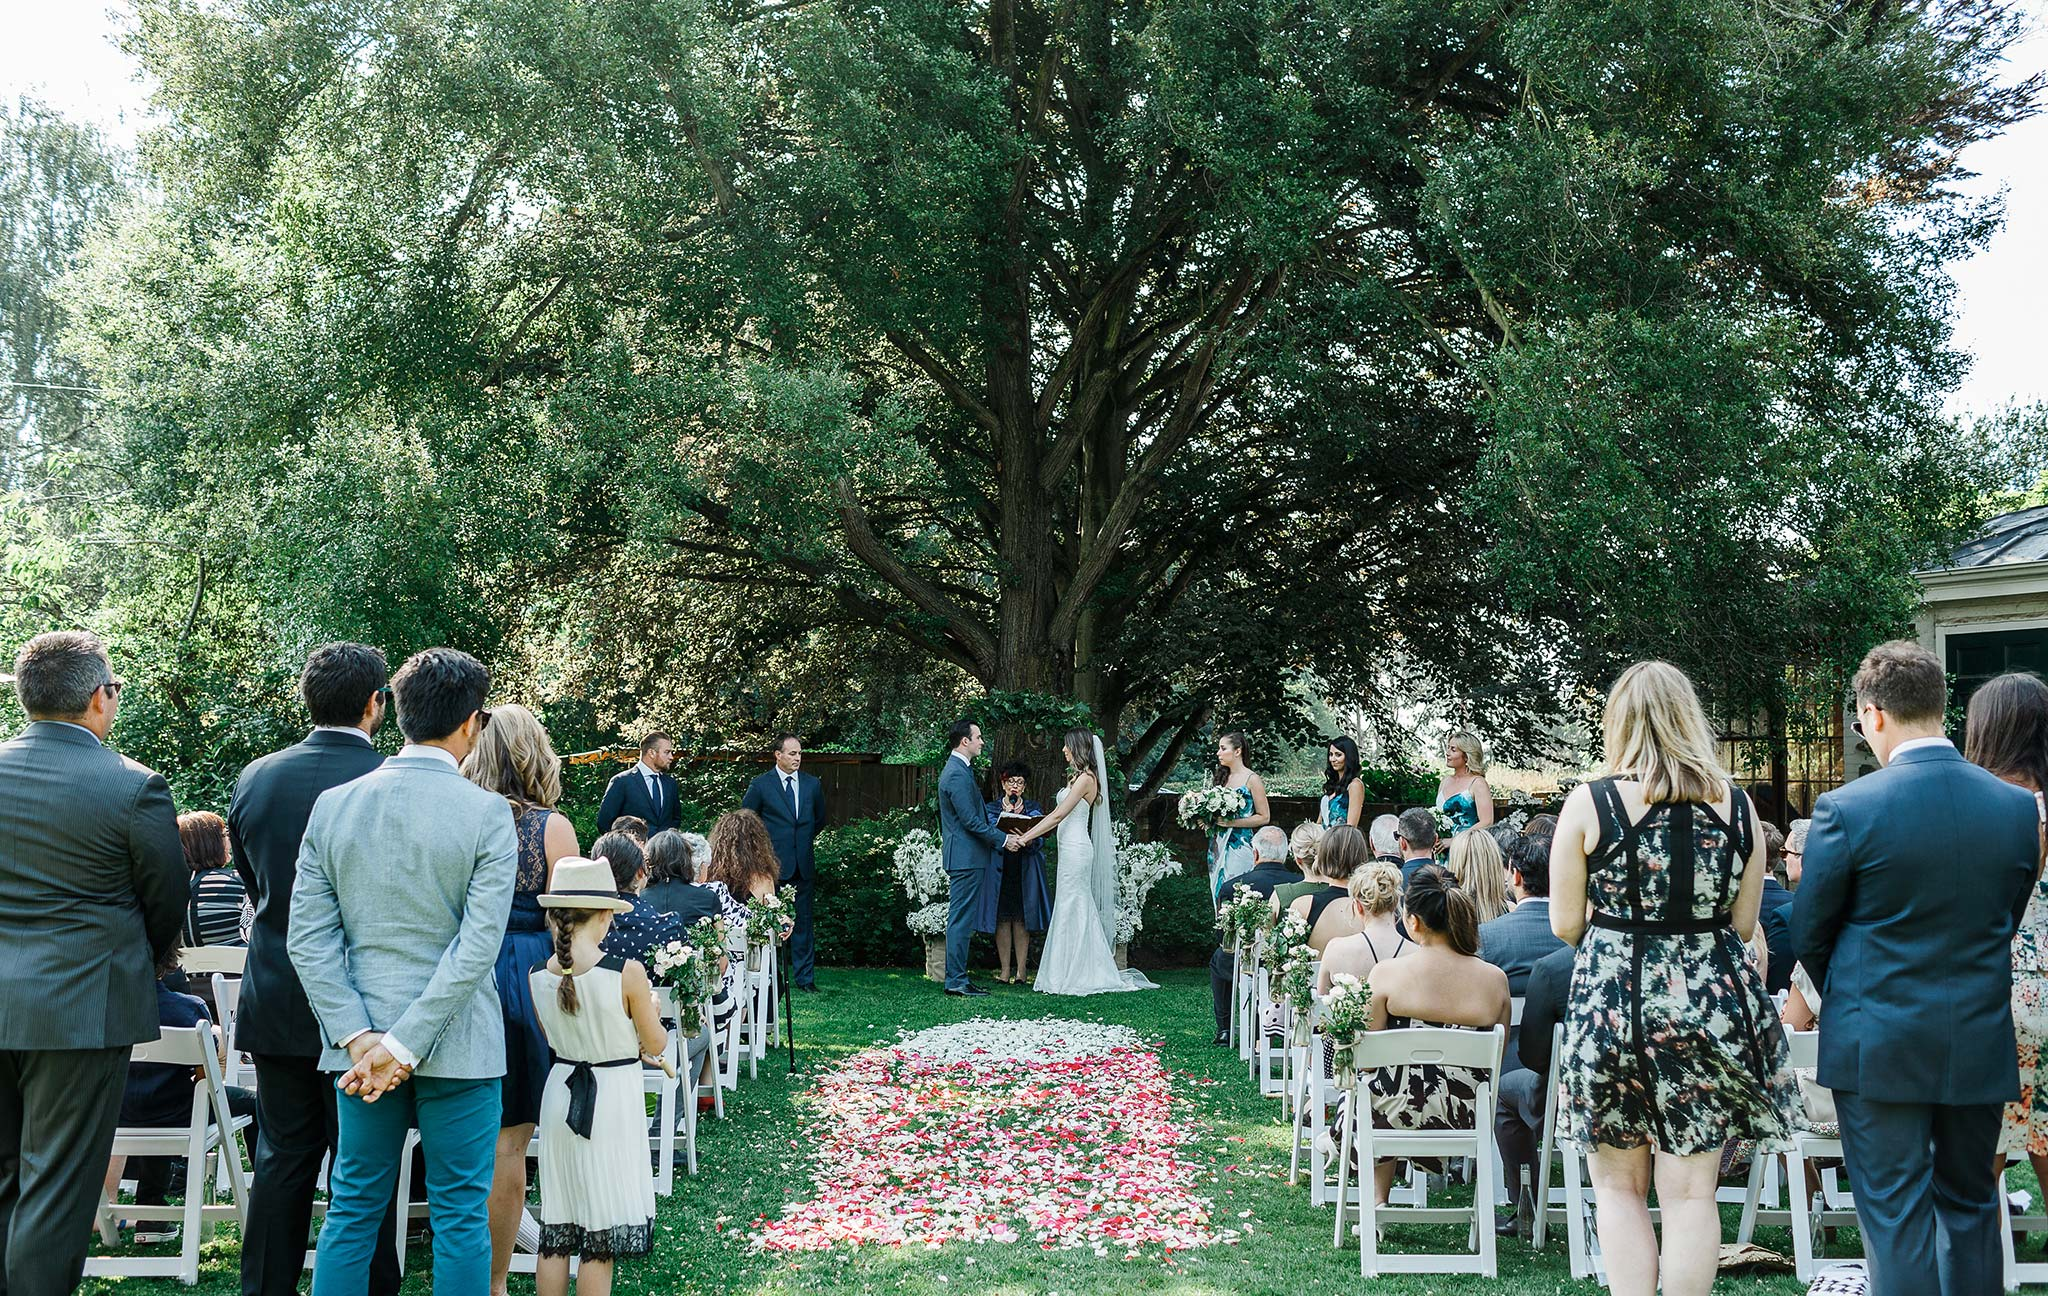 Launceston-Brickendon-barn-Wedding-Photographer-ceremony-bridal-entrance